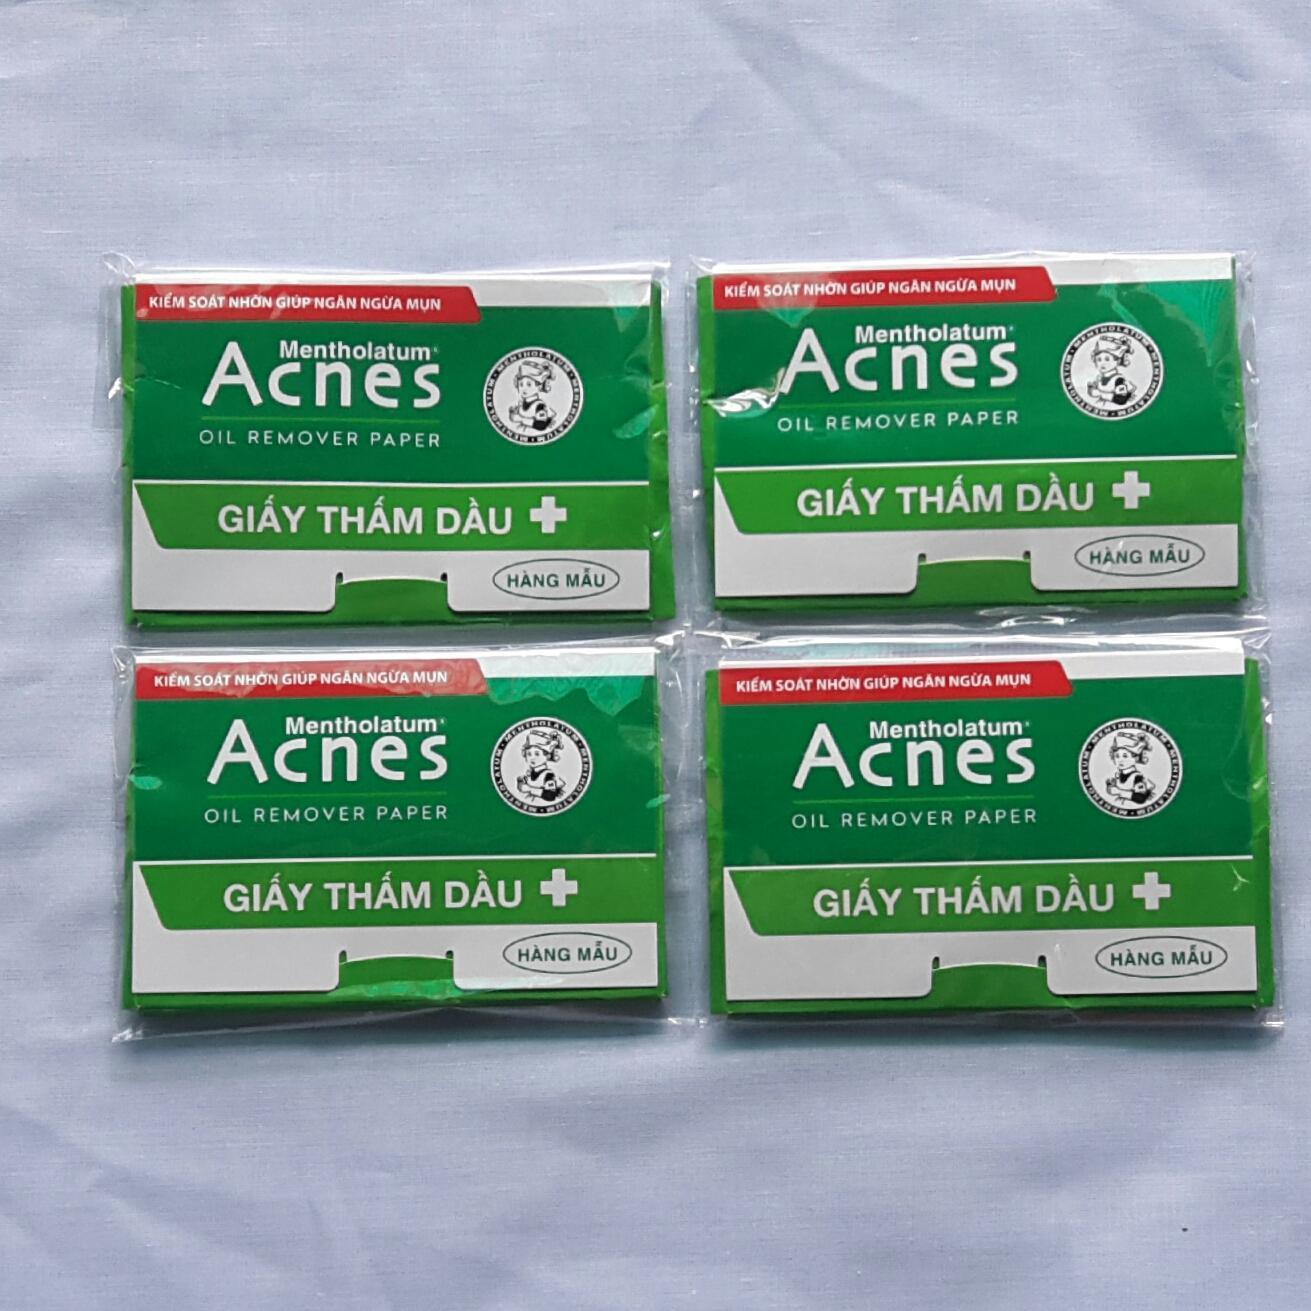 Giấy Thấm Dầu Mentholatum Acnes Oil Remover Paper- 100 tờ tốt nhất